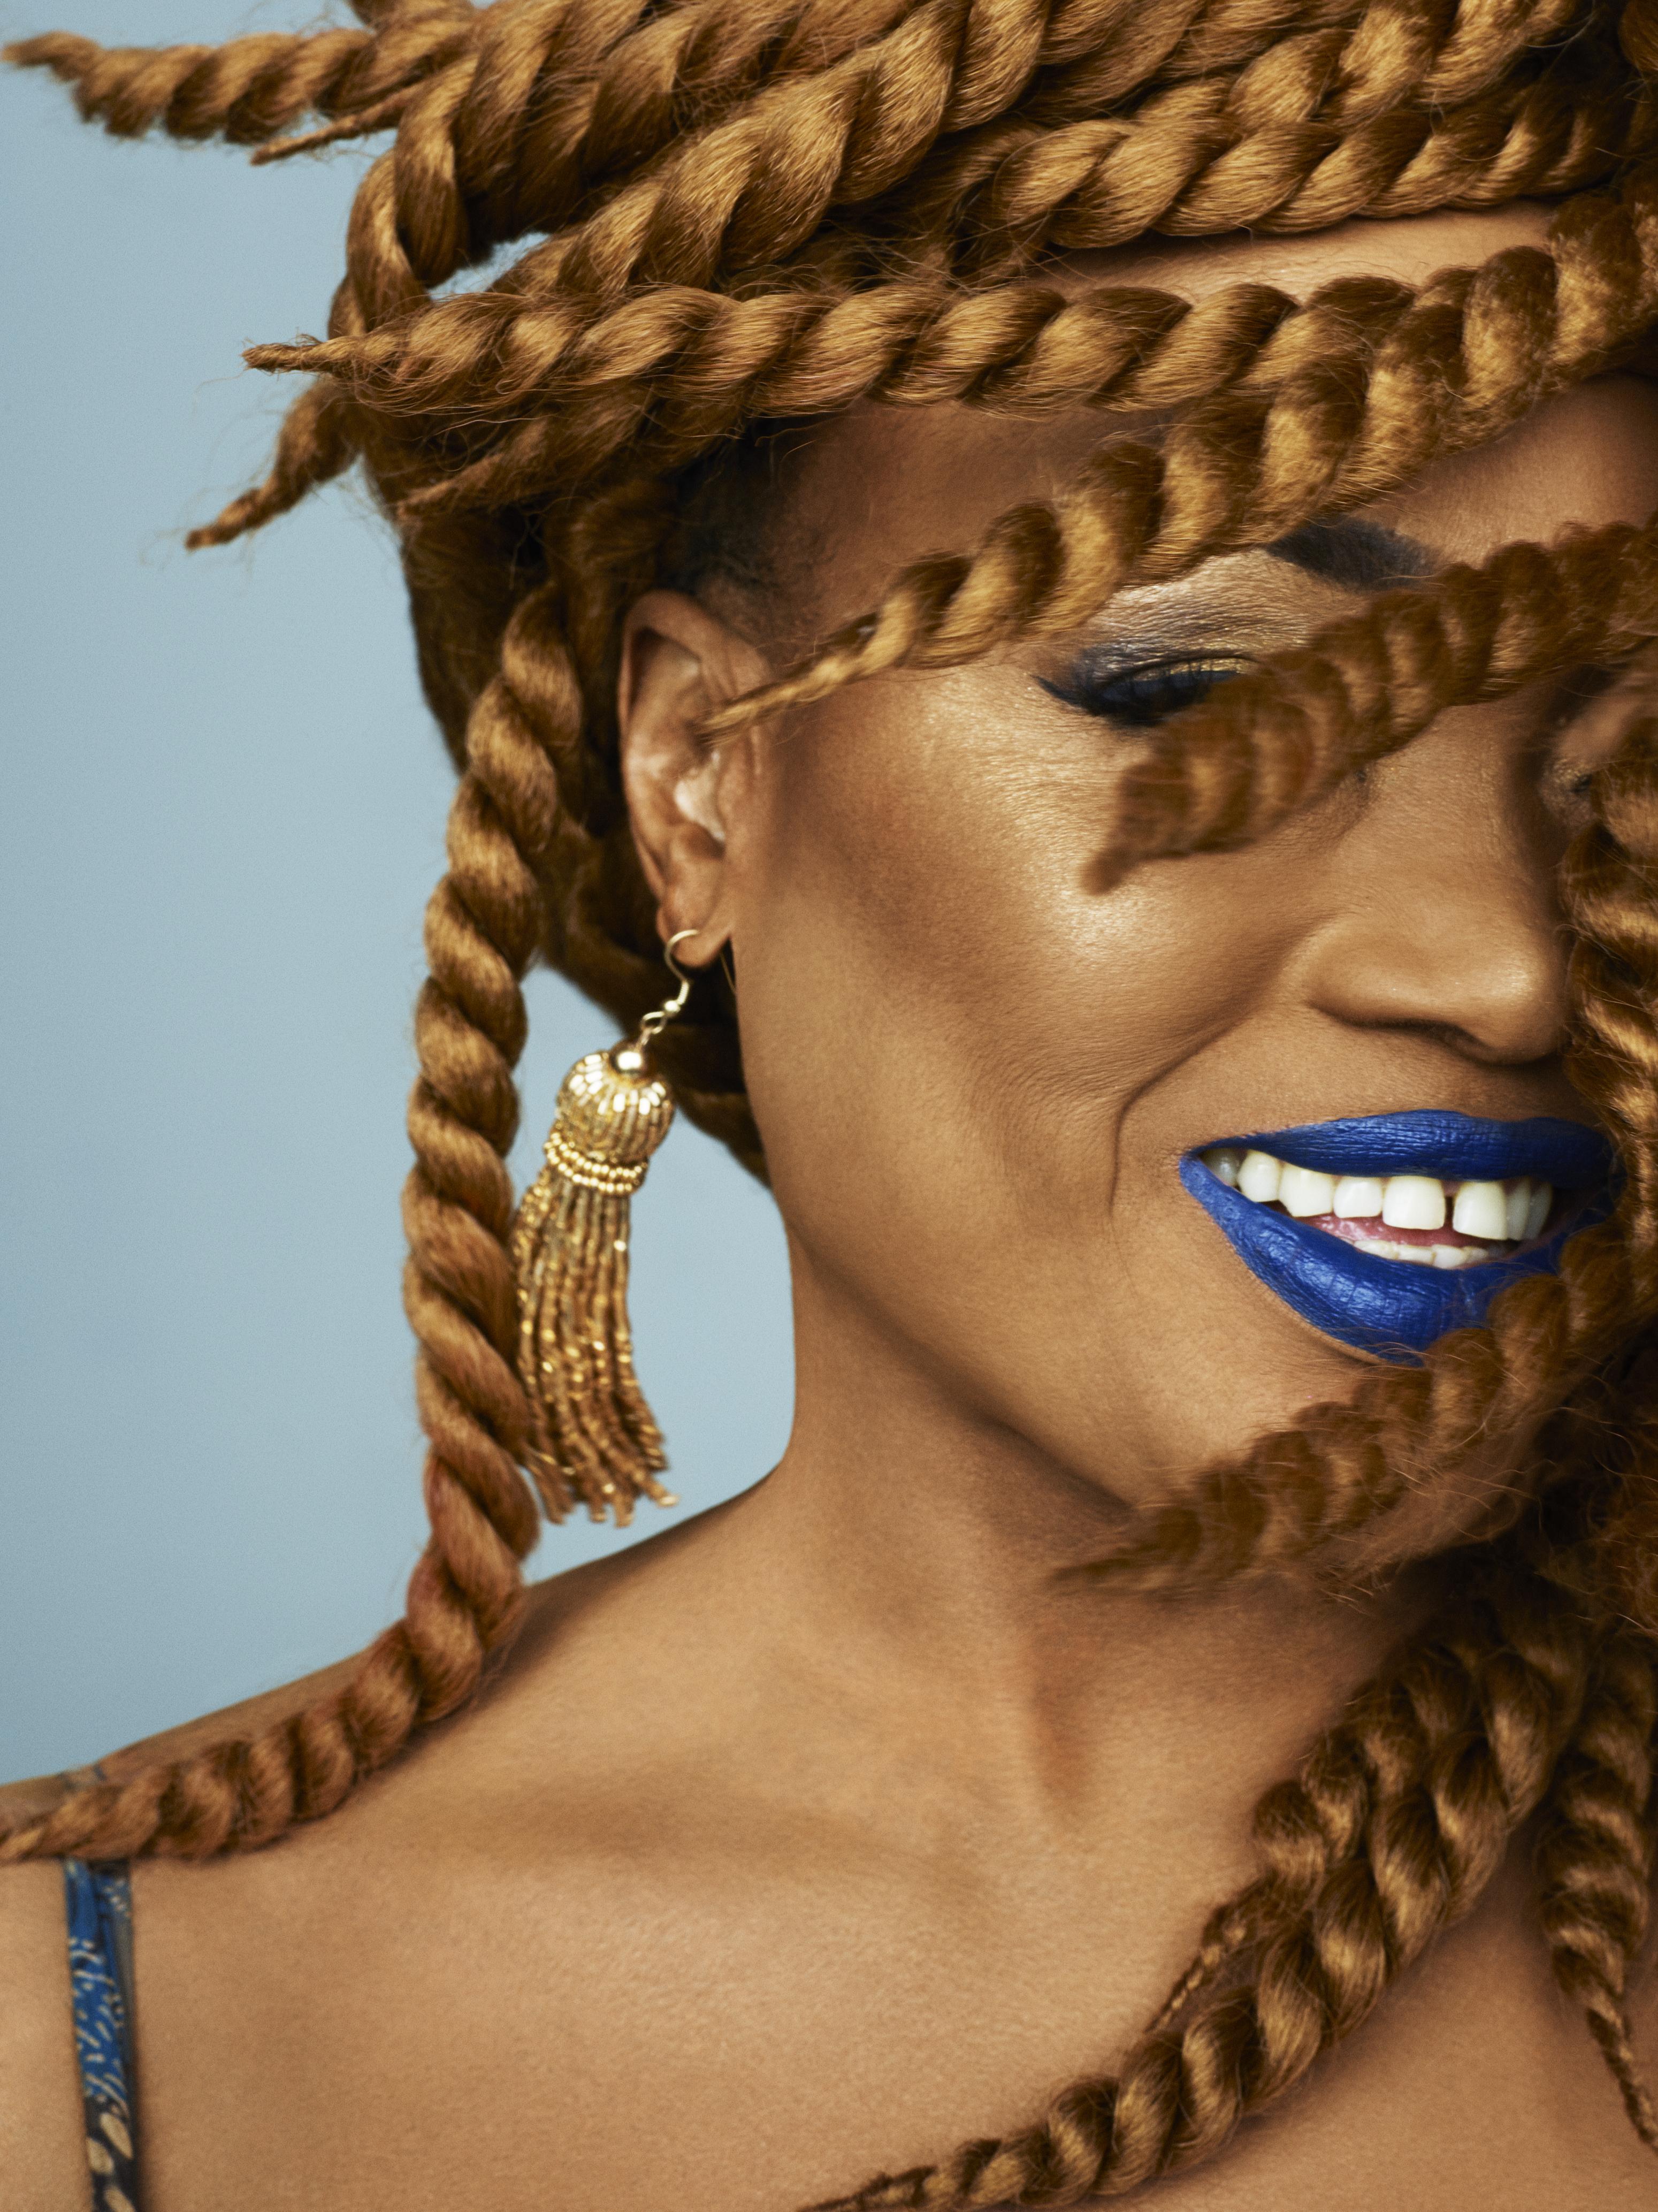 """Yere Faga:"" A Fierce New Video by Oumou Sangaré with Tony Allen"